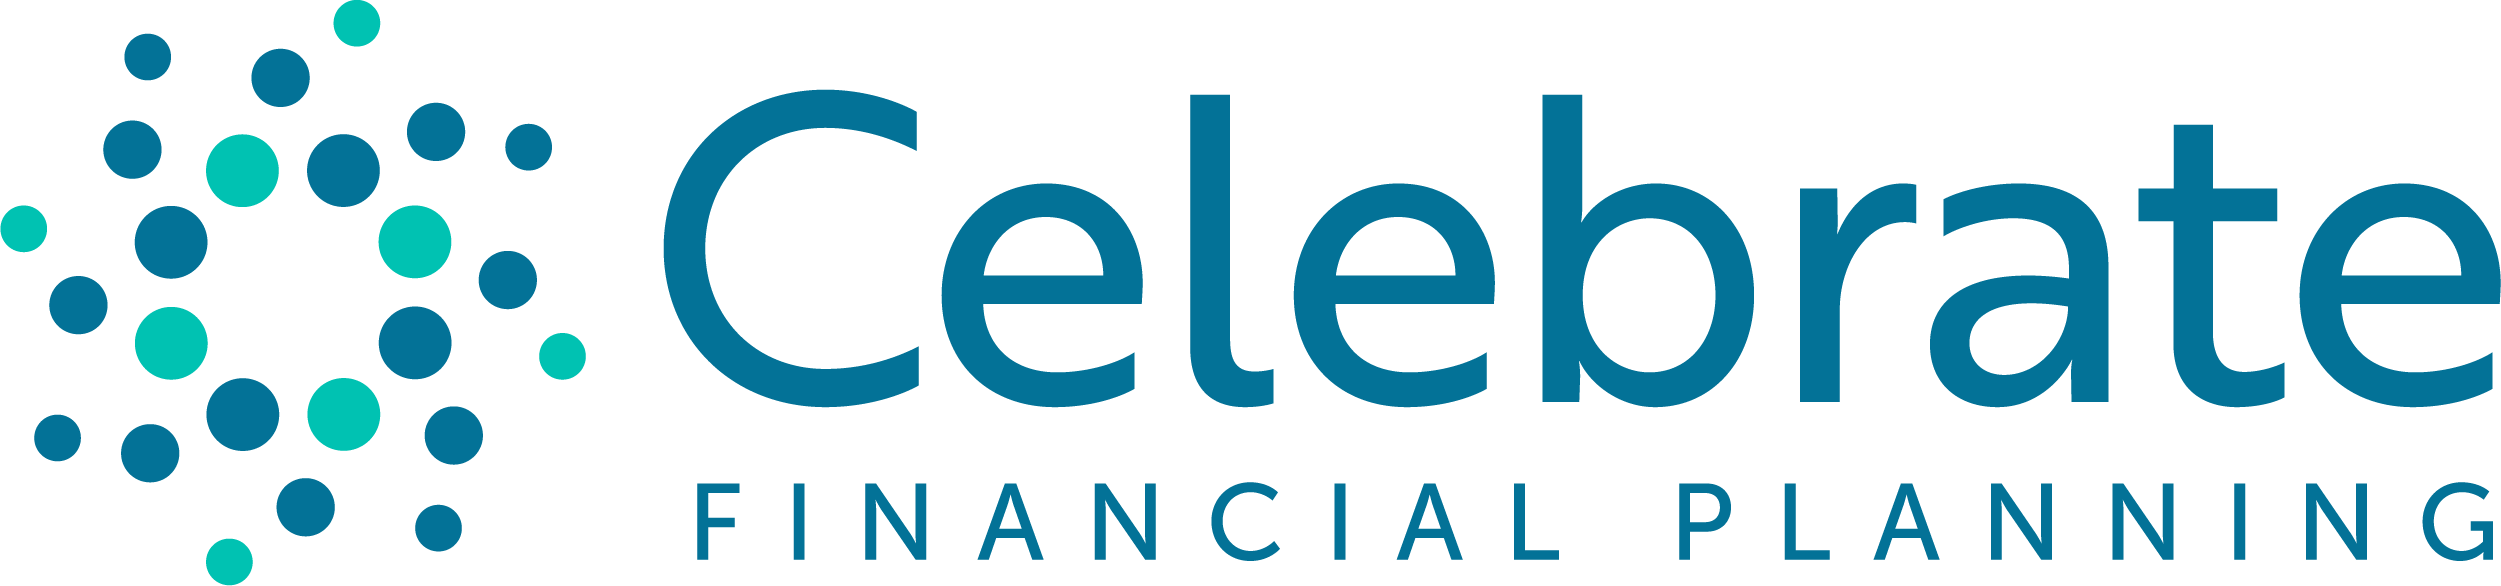 Celebrate Financial Planning Celebrate Financial Planning Cincinnati, OH